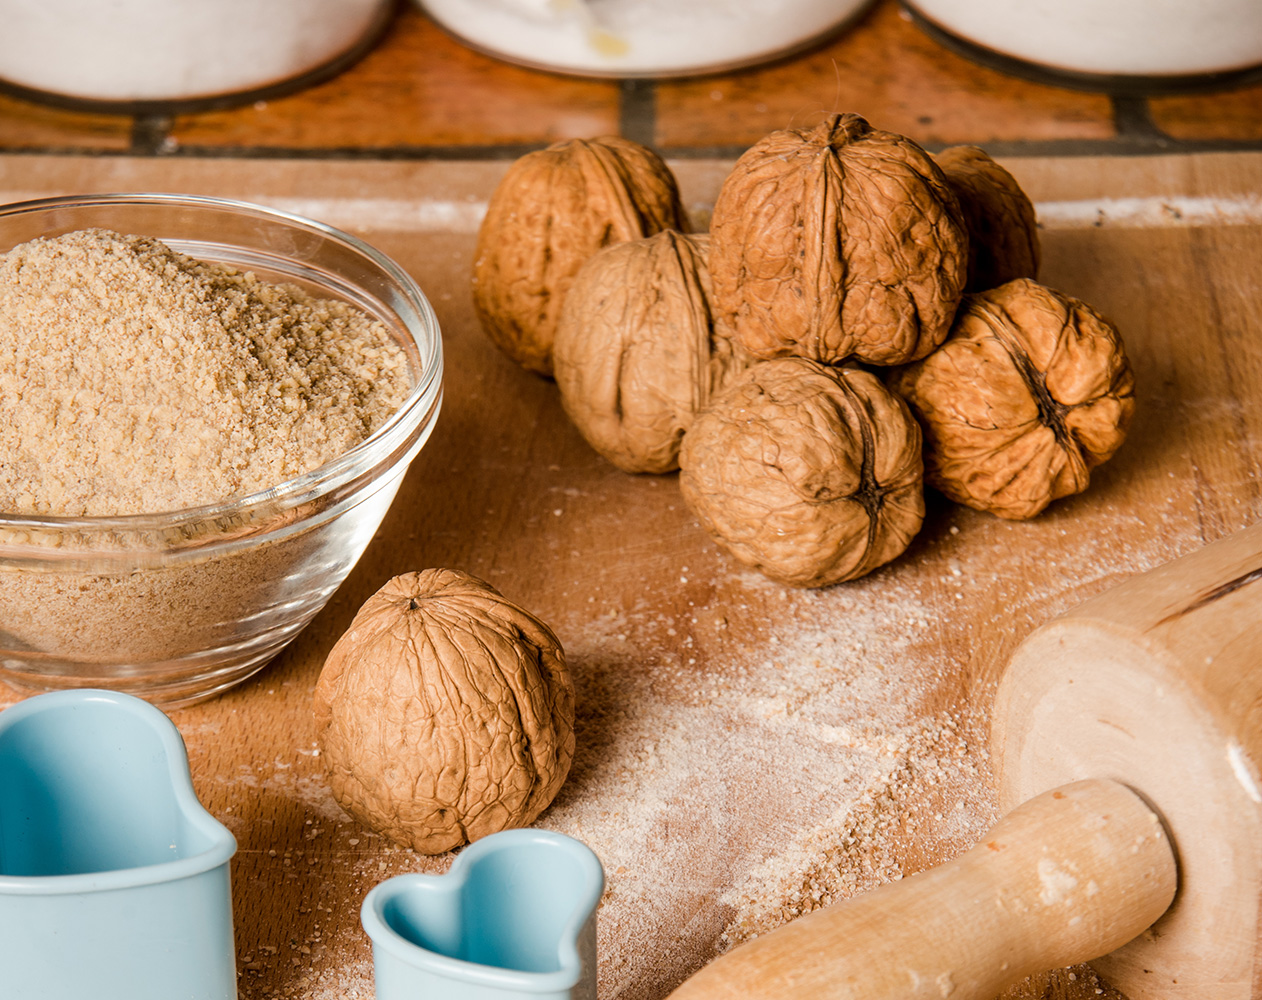 Farina di noci vendita online - Walnut flour for sale